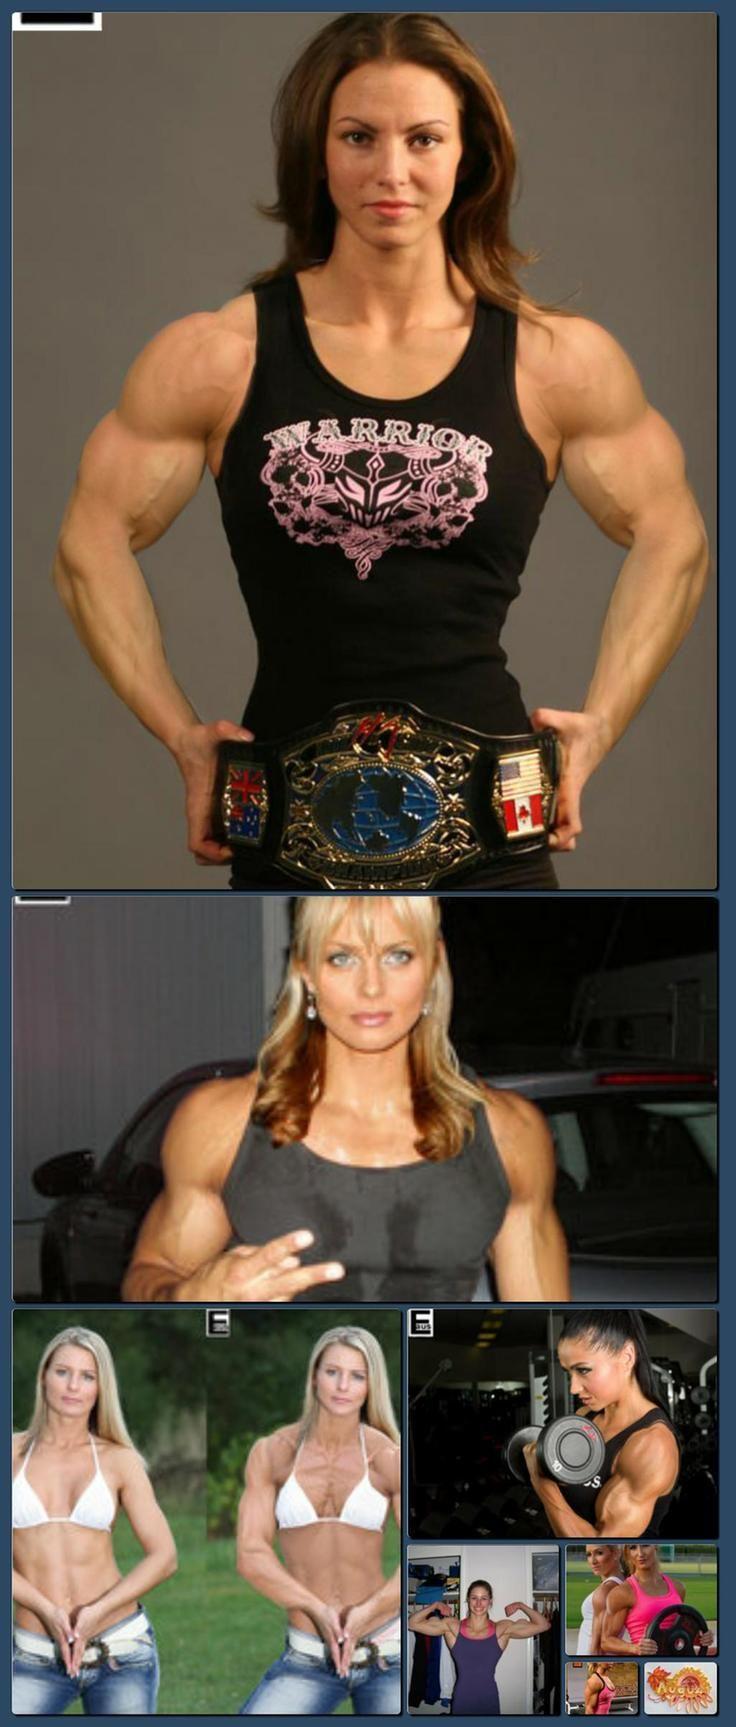 Muscular Wrestler by ~edinaus on deviantART   Exercise and ...